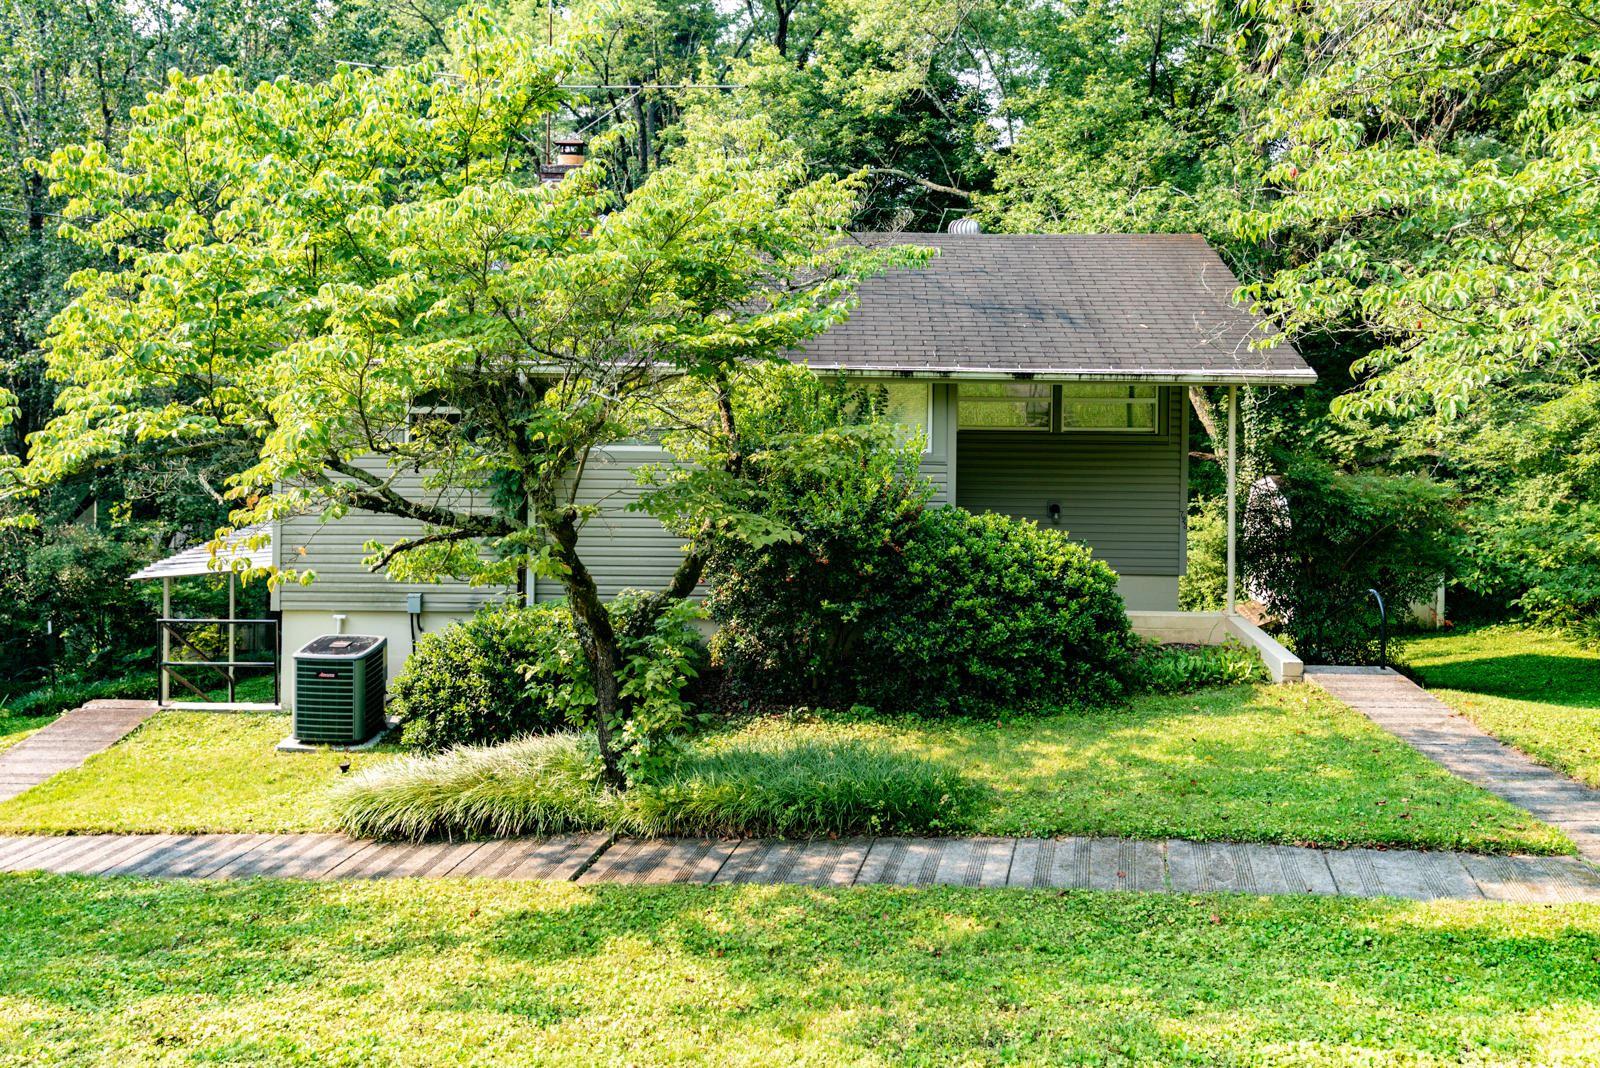 Photo of 723 Florida Ave, Oak Ridge, TN 37830 (MLS # 1161312)